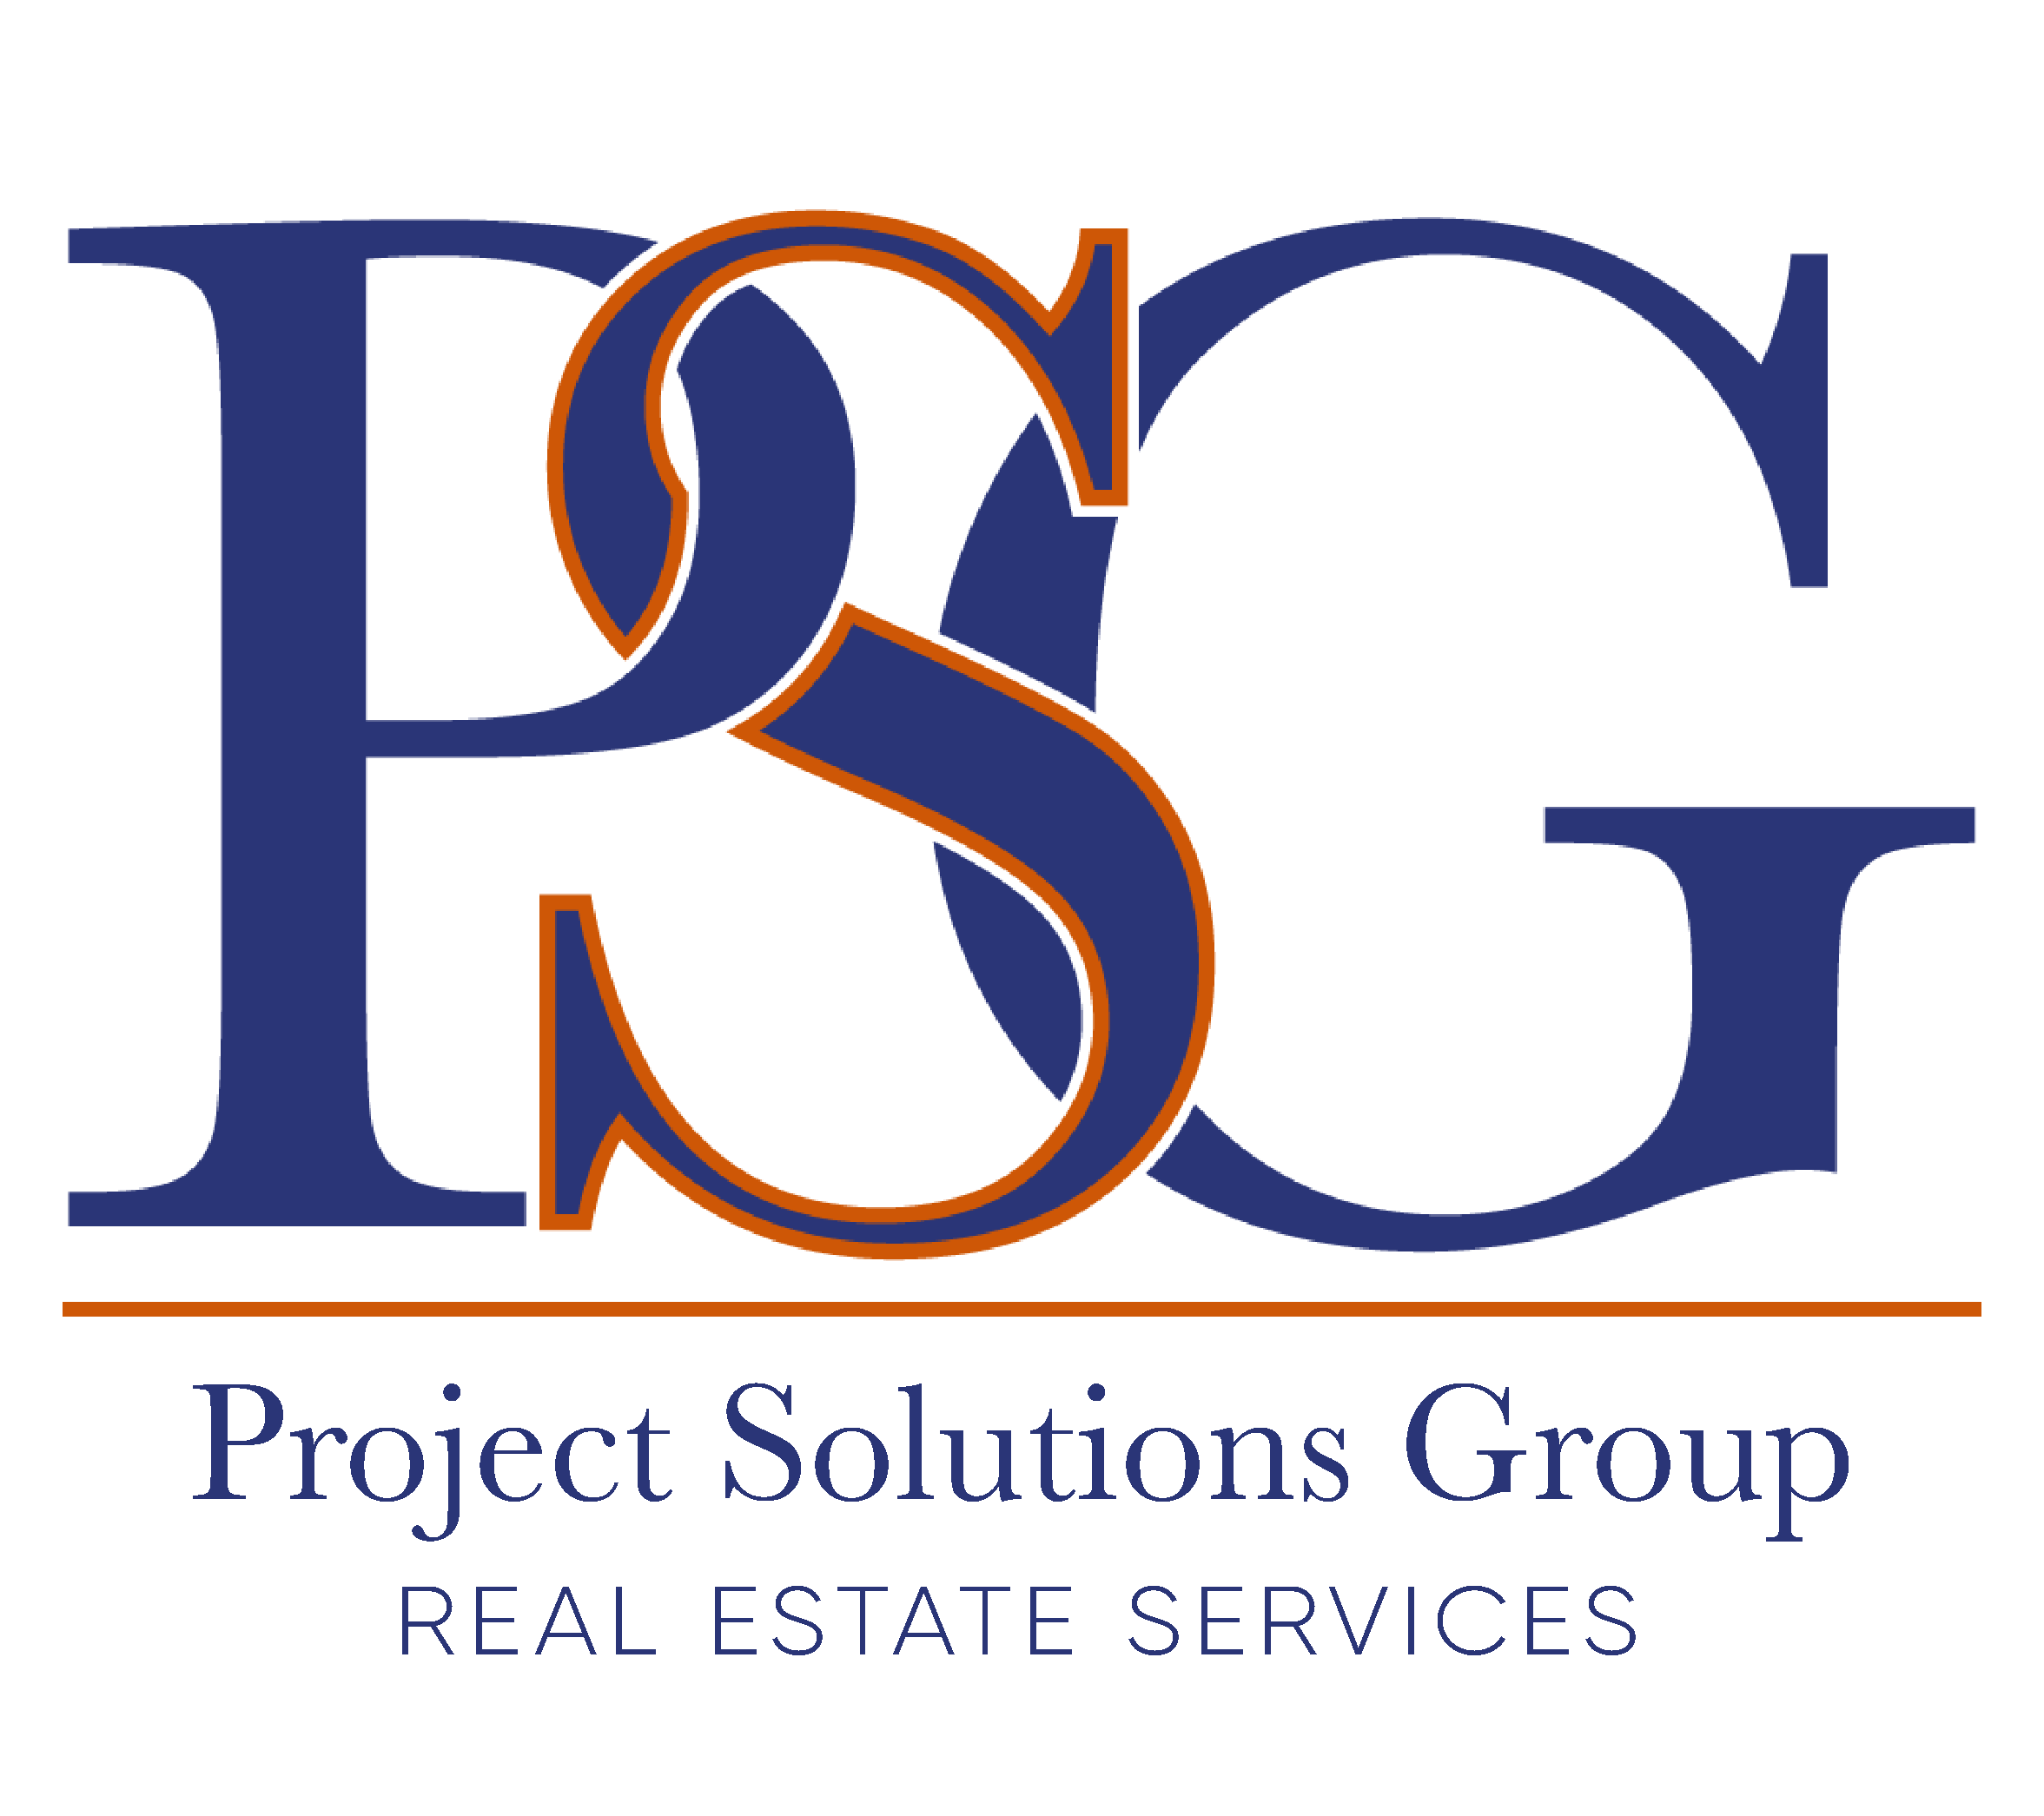 PSG Real Estate